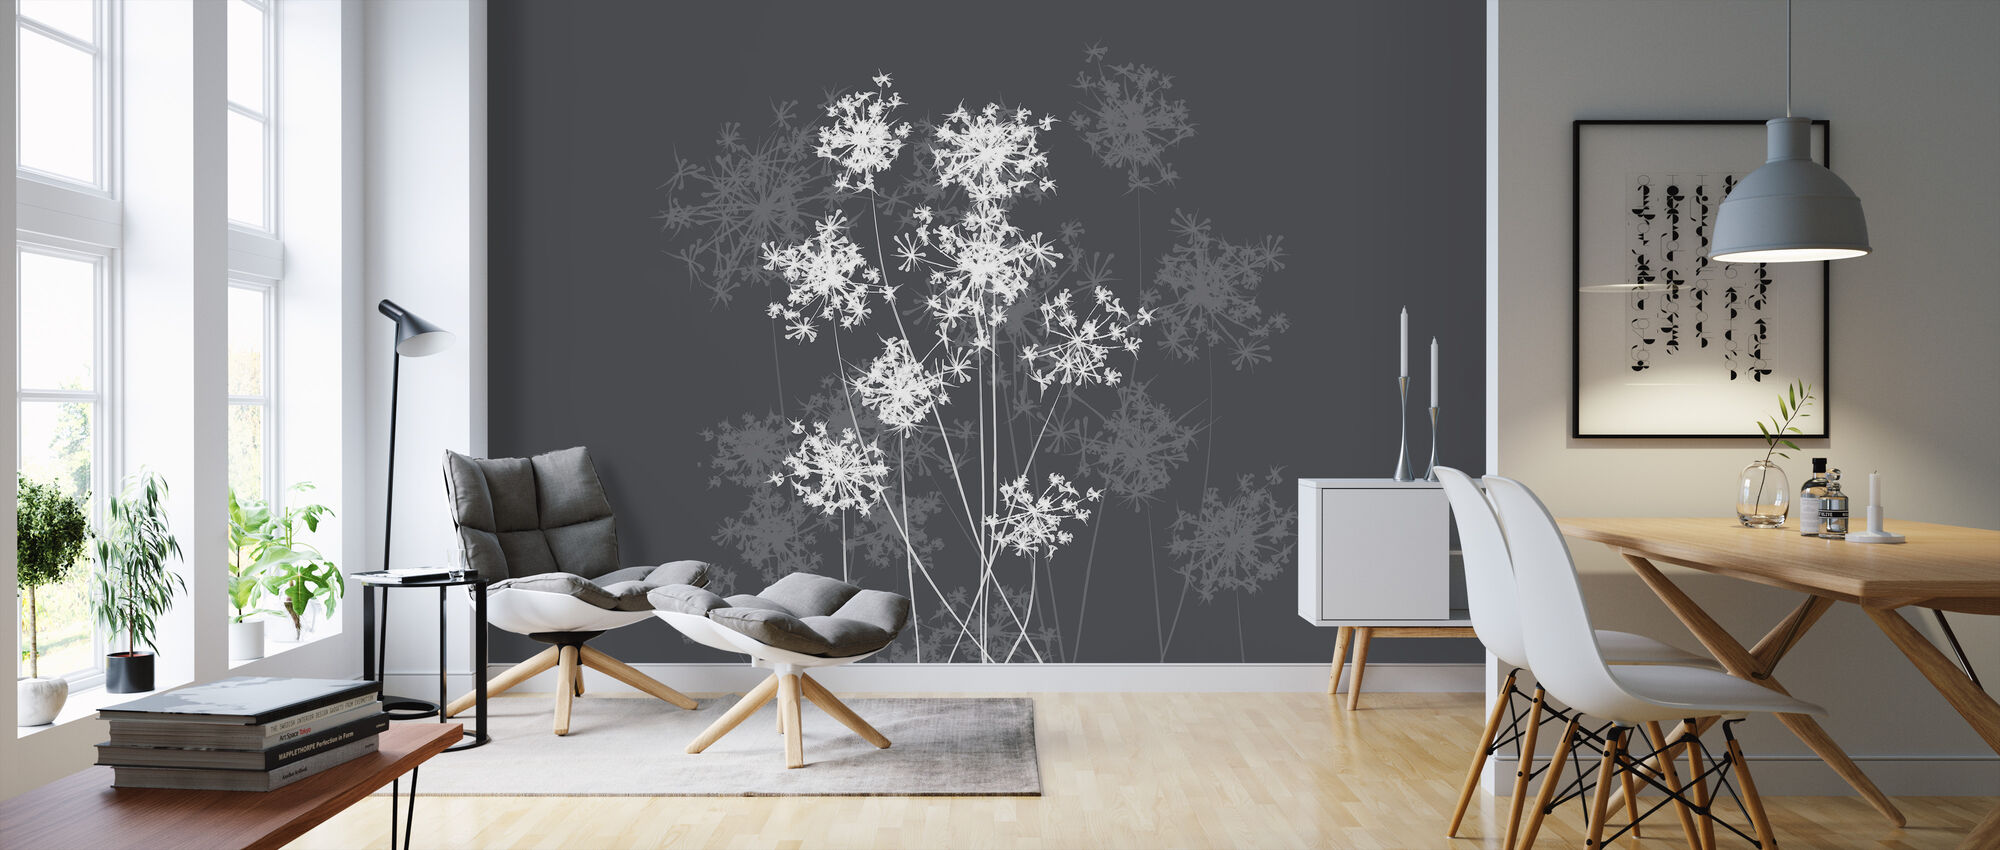 Dandelion Grey - Wallpaper - Living Room